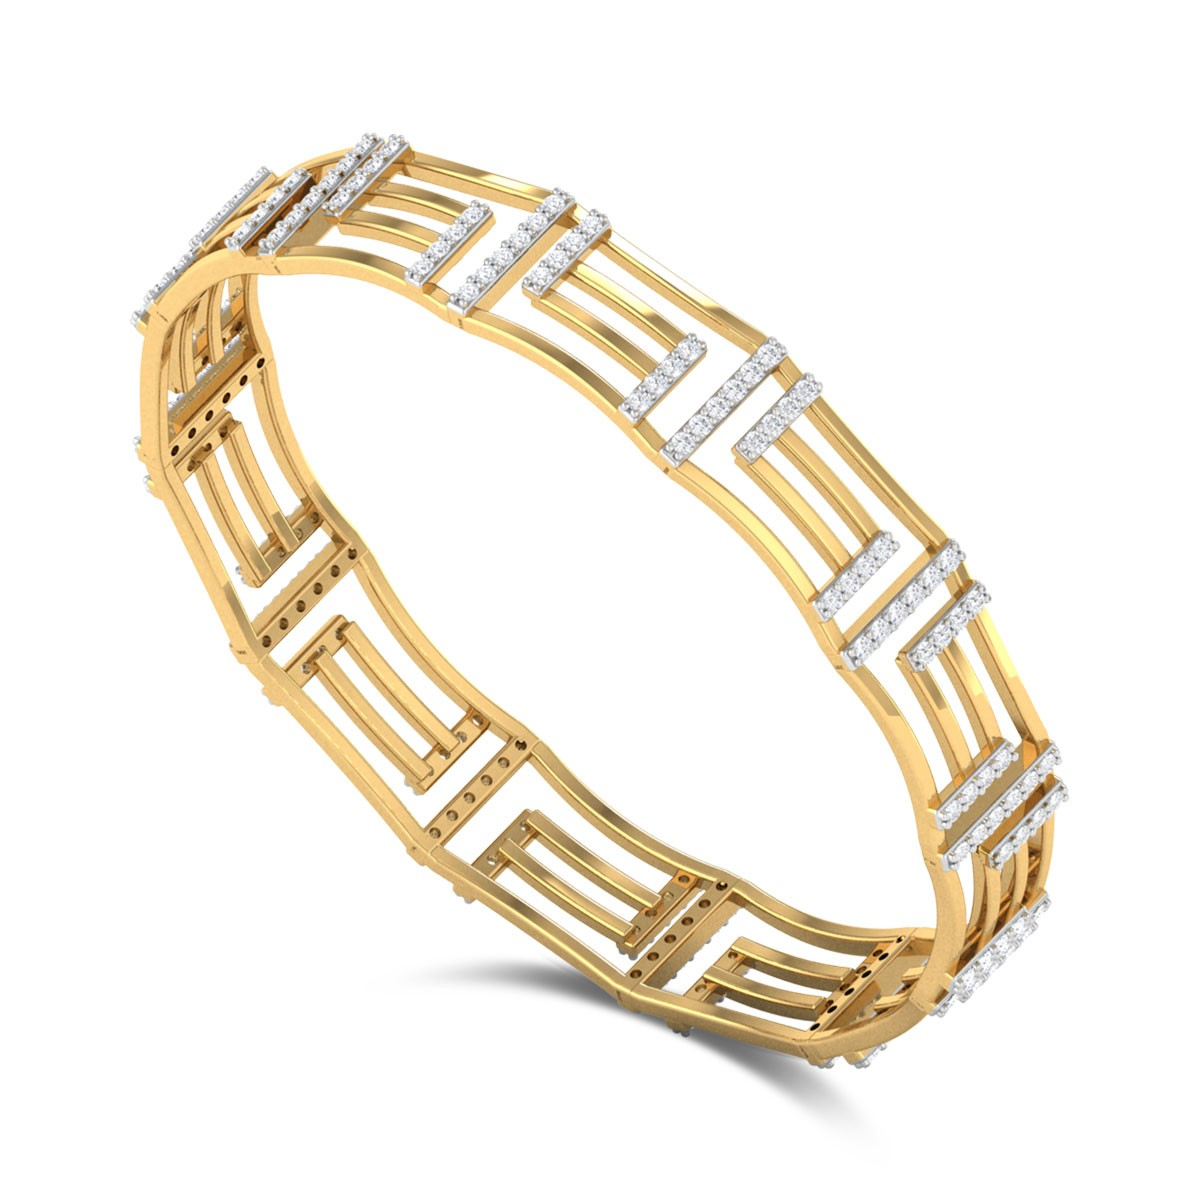 Geometric Linked Diamond Bangle